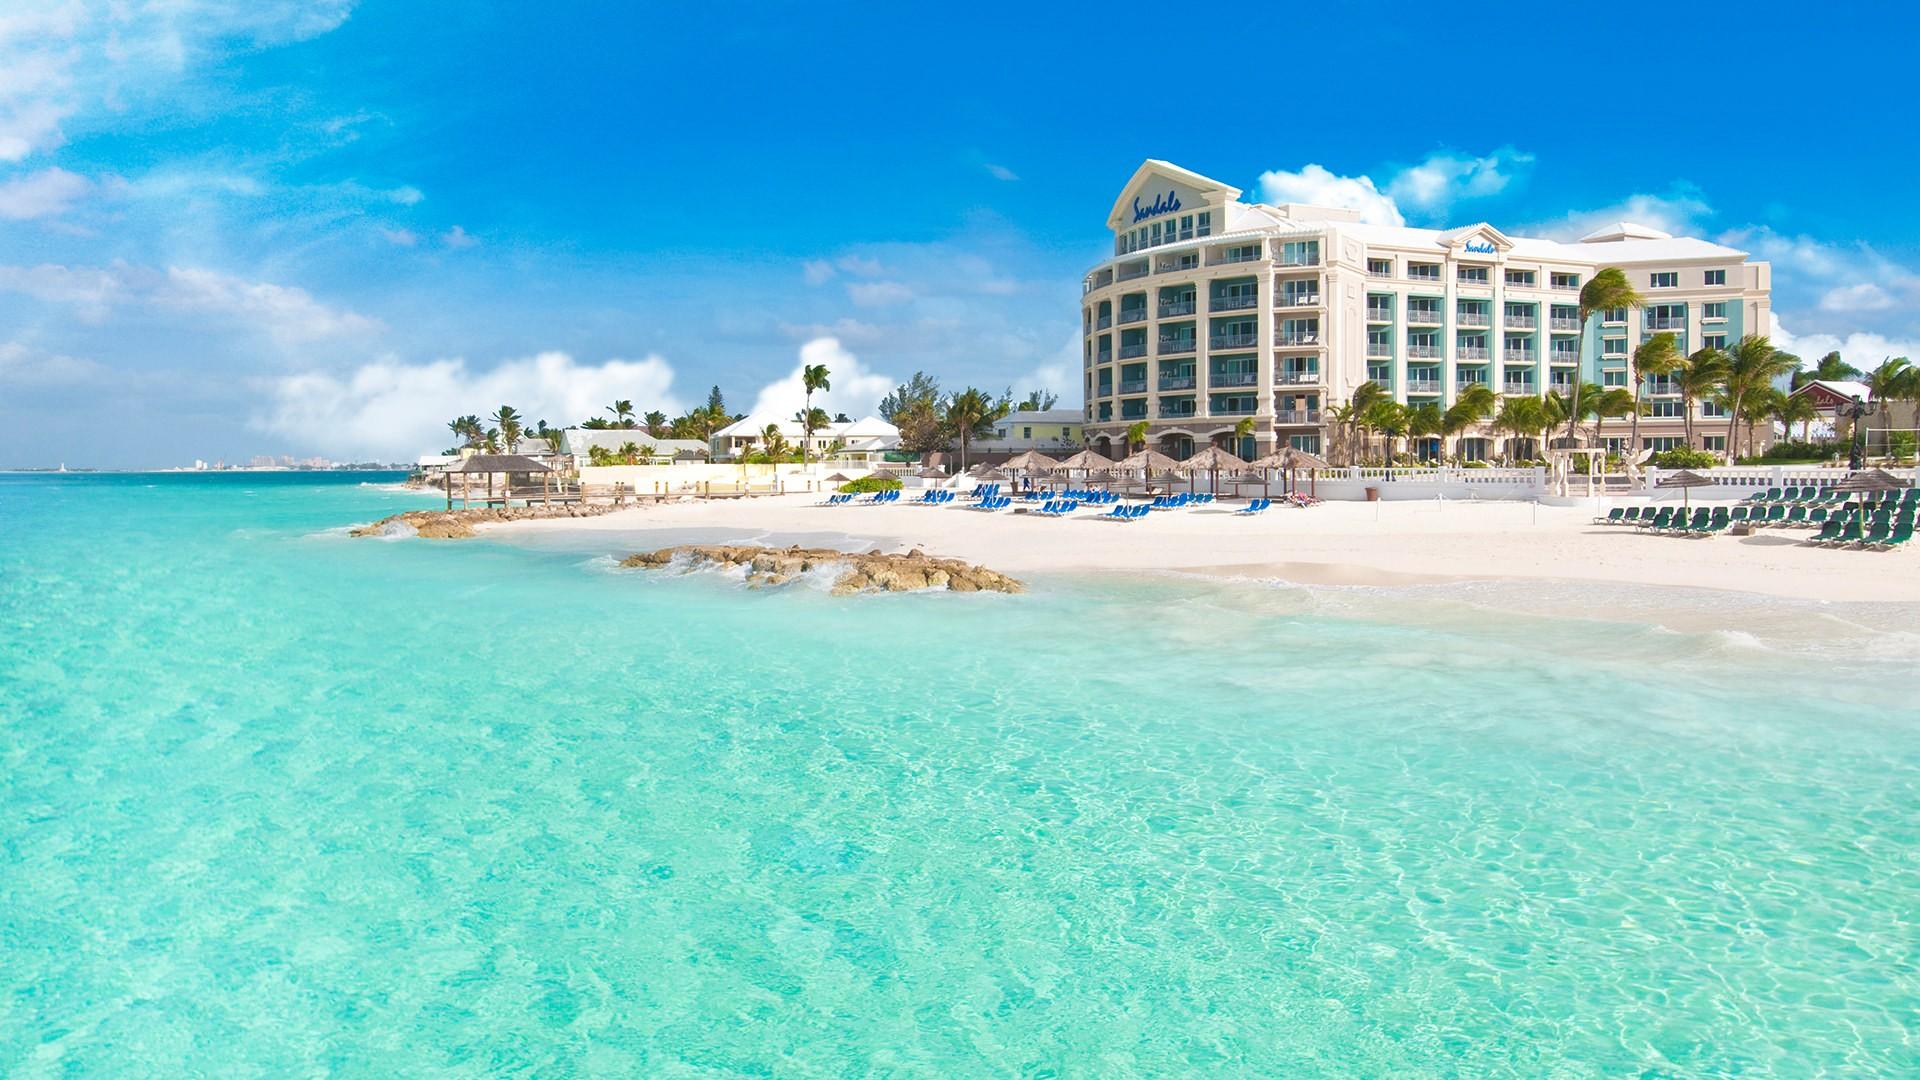 Balmoral Zen Garden Room Sandals Royal Bahamian Spa Resort